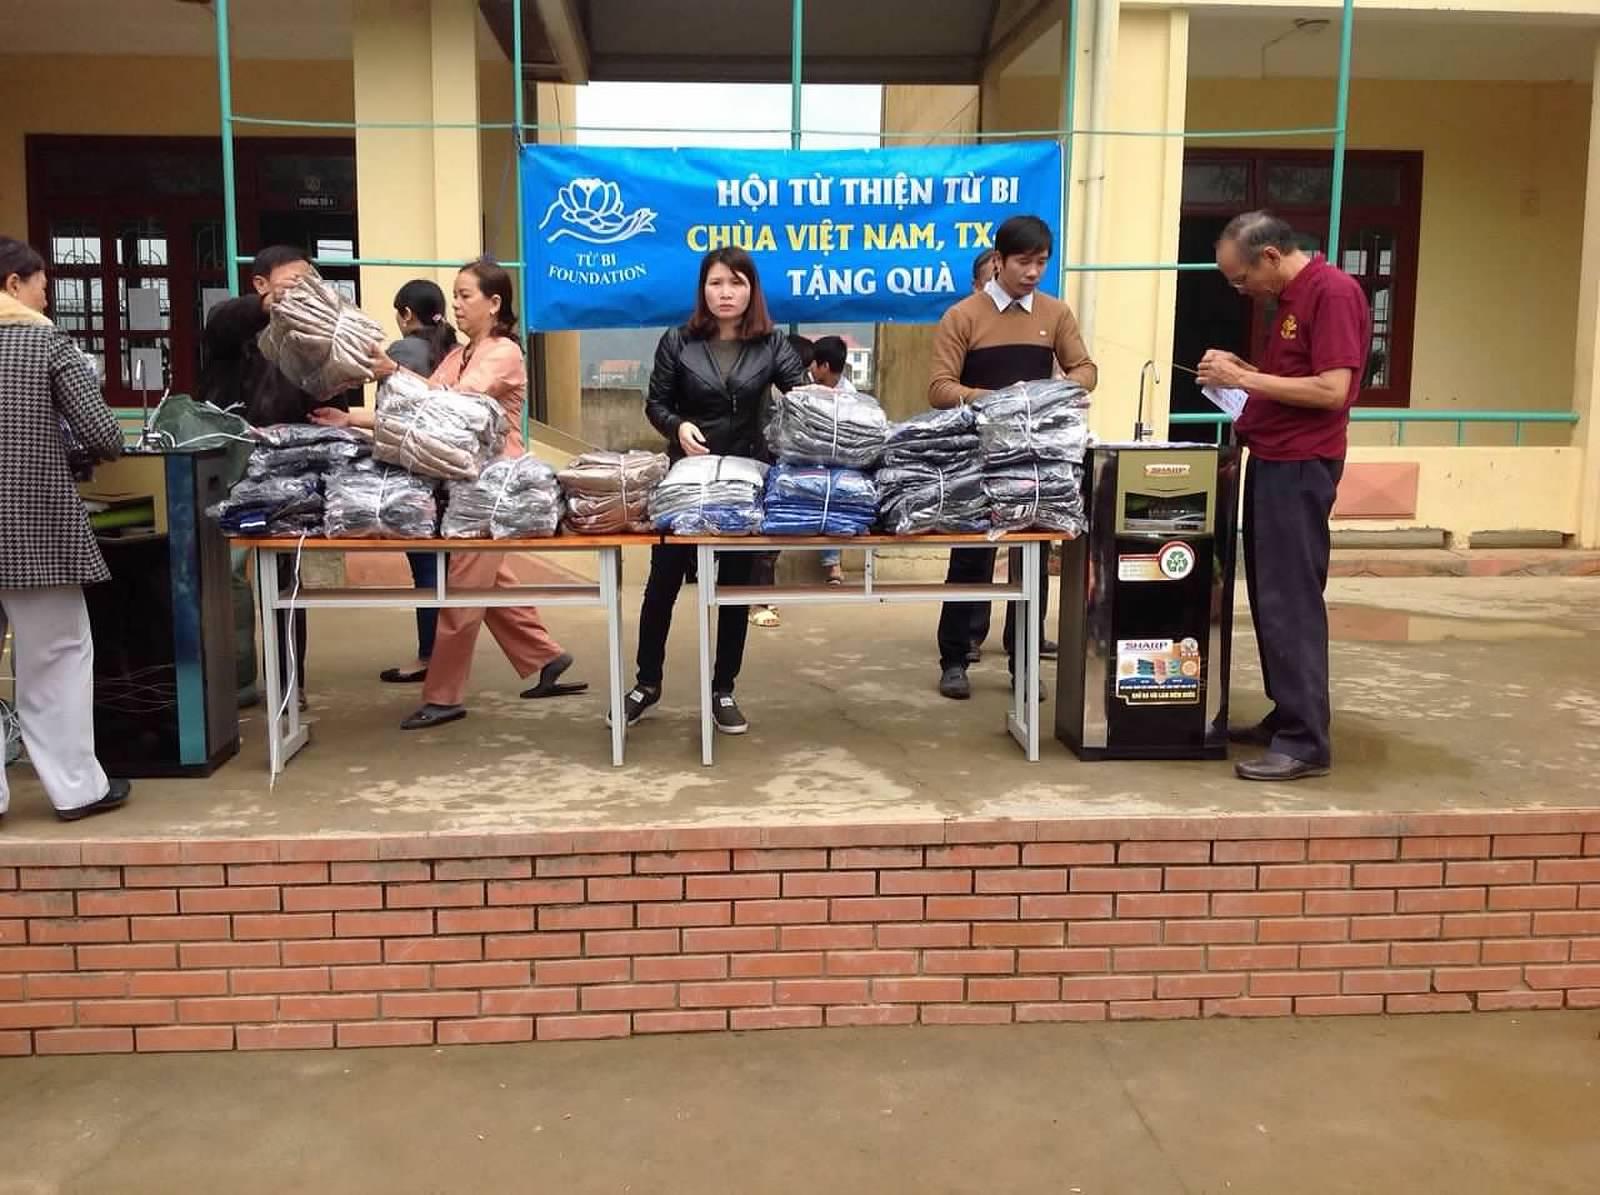 Quang Binh 2 (74)